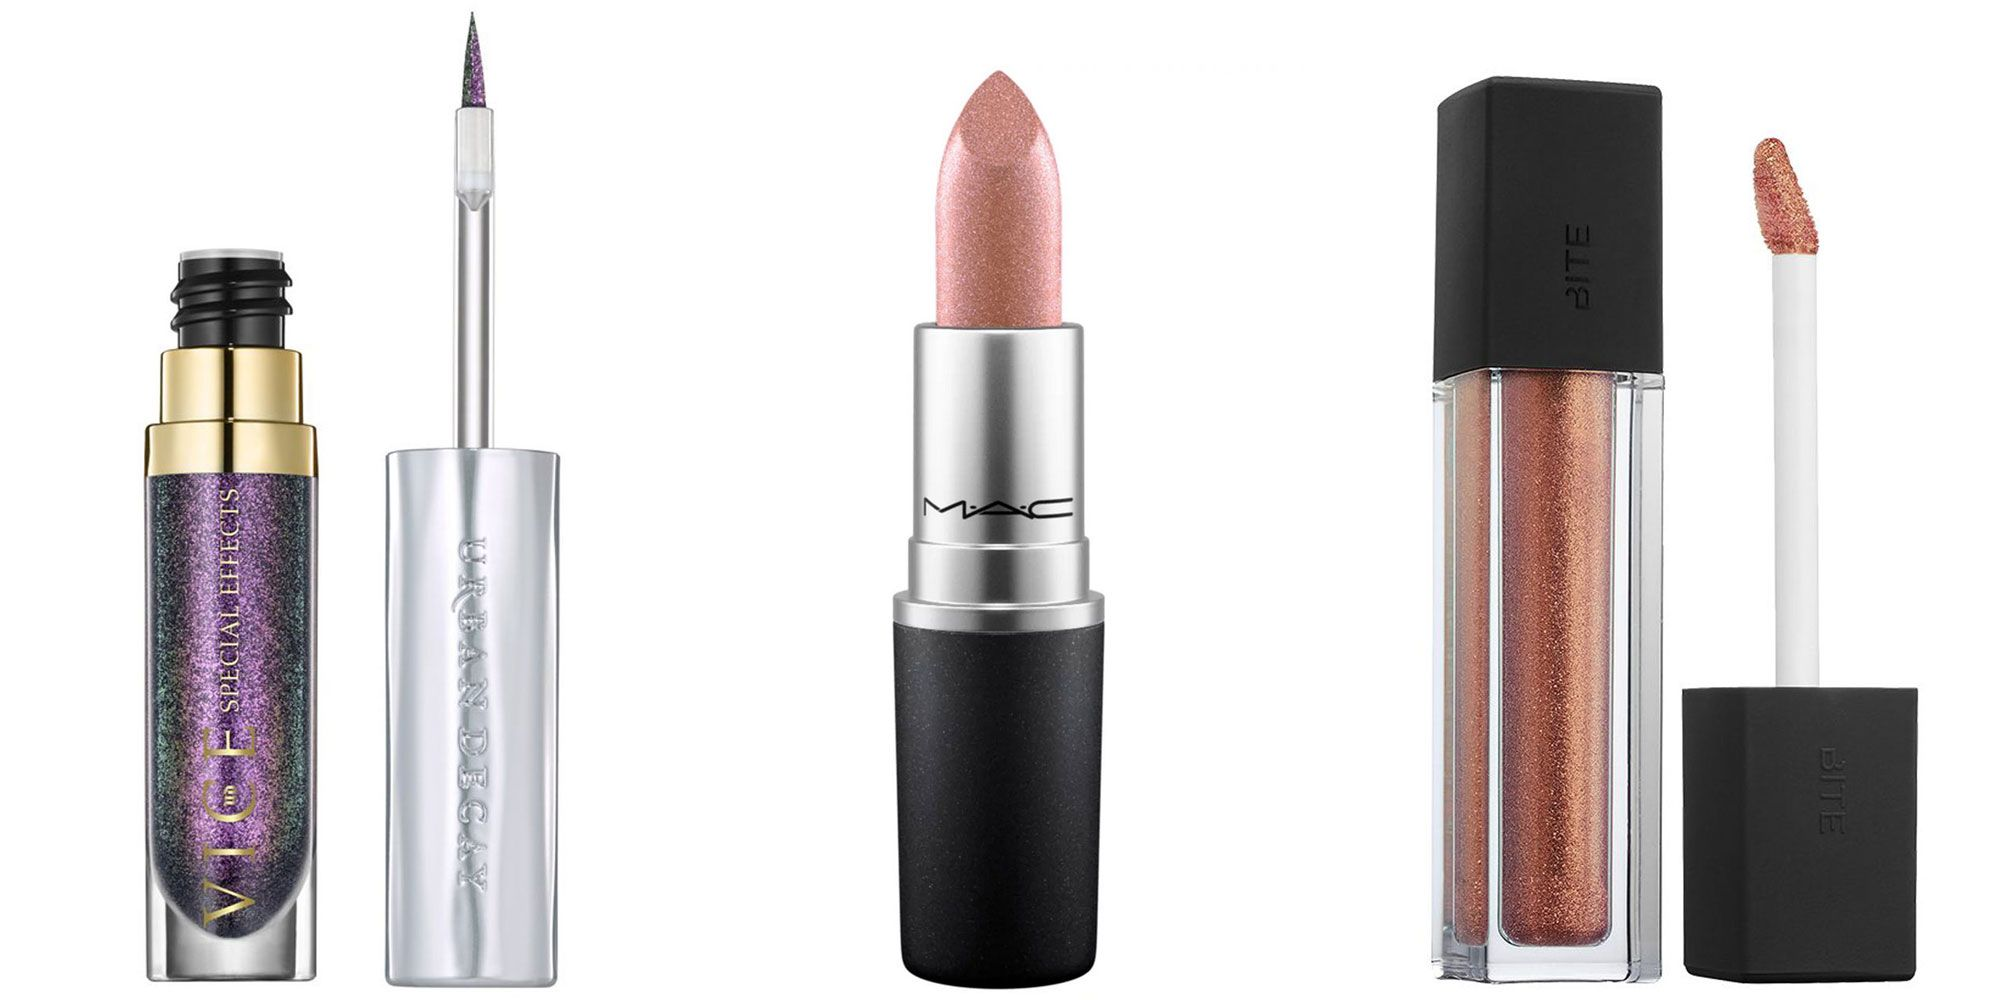 11 Metallic Lipsticks You Need To Try - The Best New Metallic ...